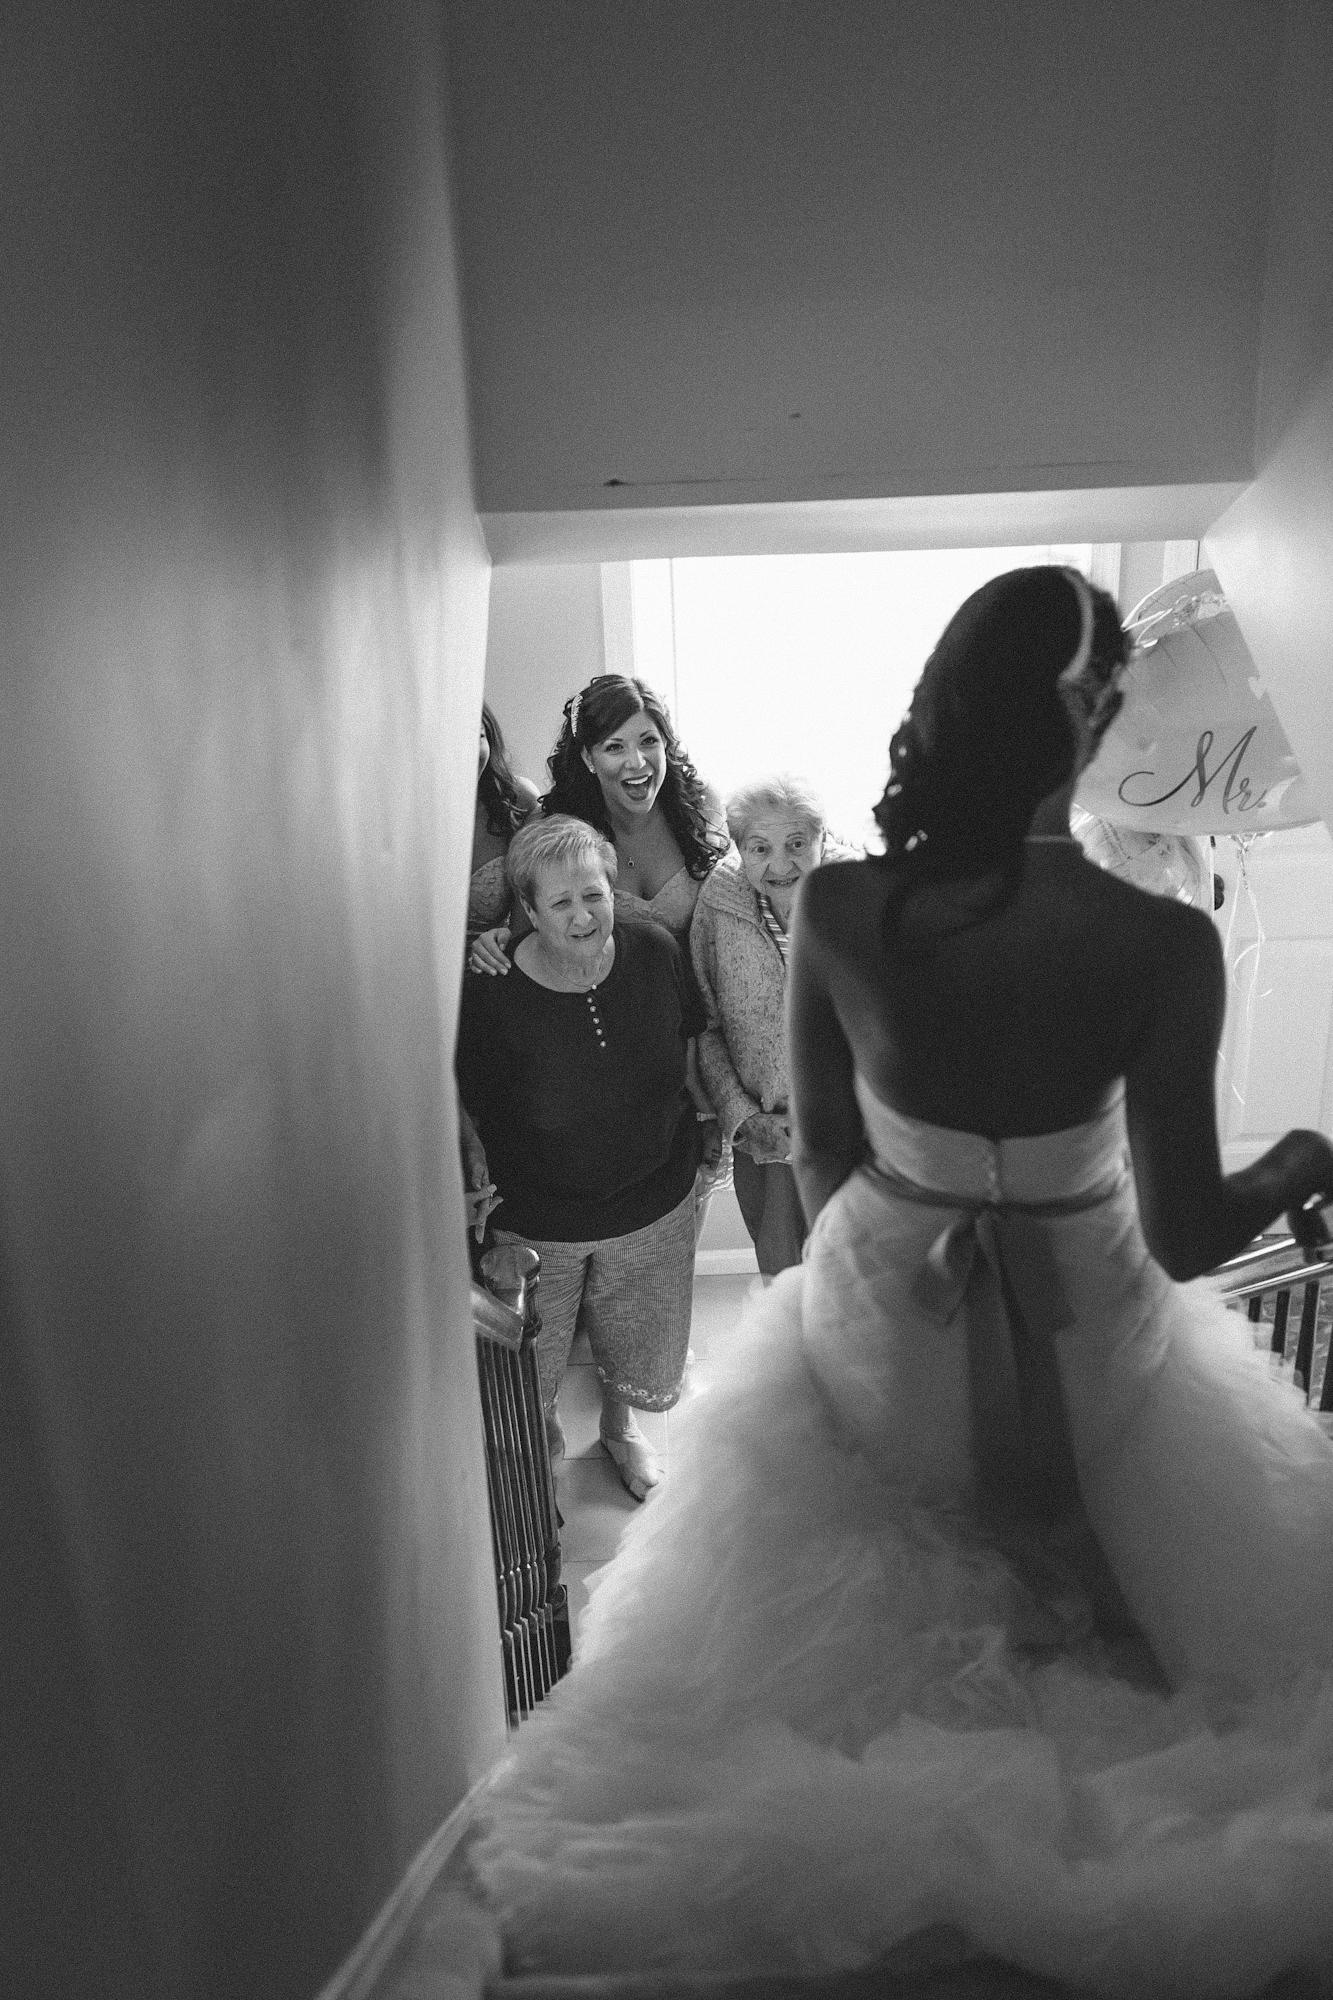 20140802_CL_new-york-city-wedding-photography-3.jpg